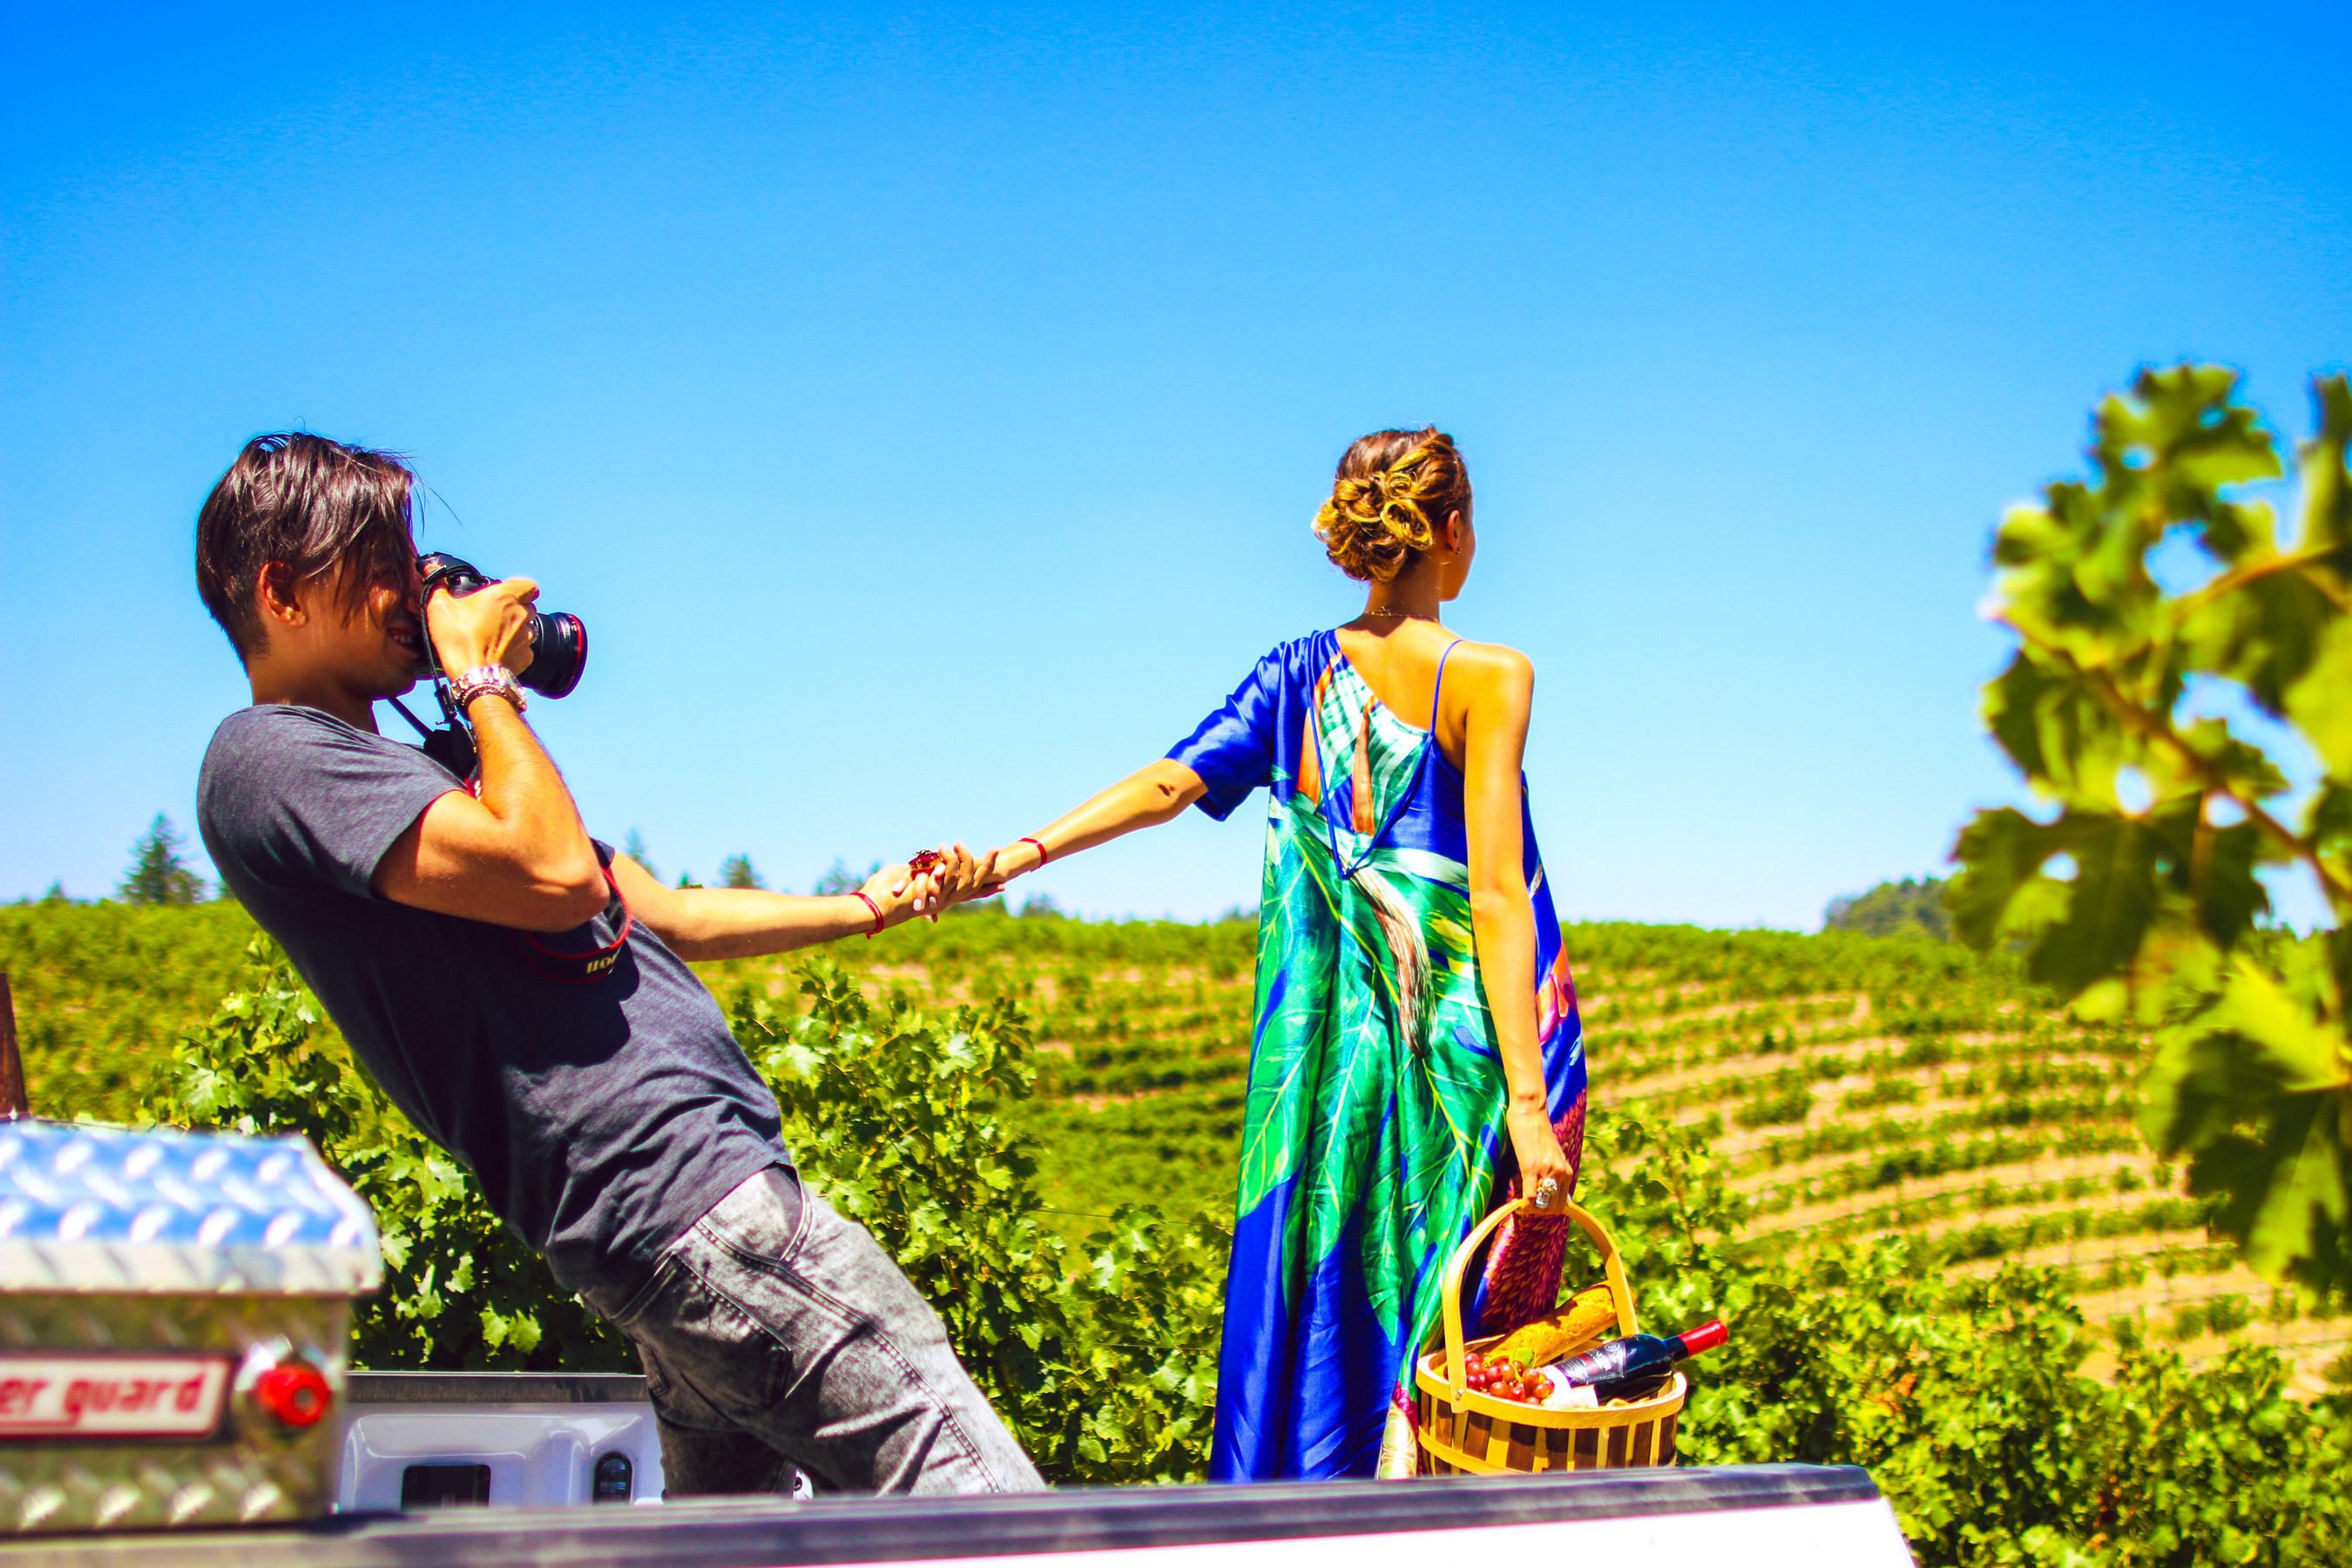 Renowned #FollowMeTo Photographer Shoots New Beringer Vineyards Advertising Creative